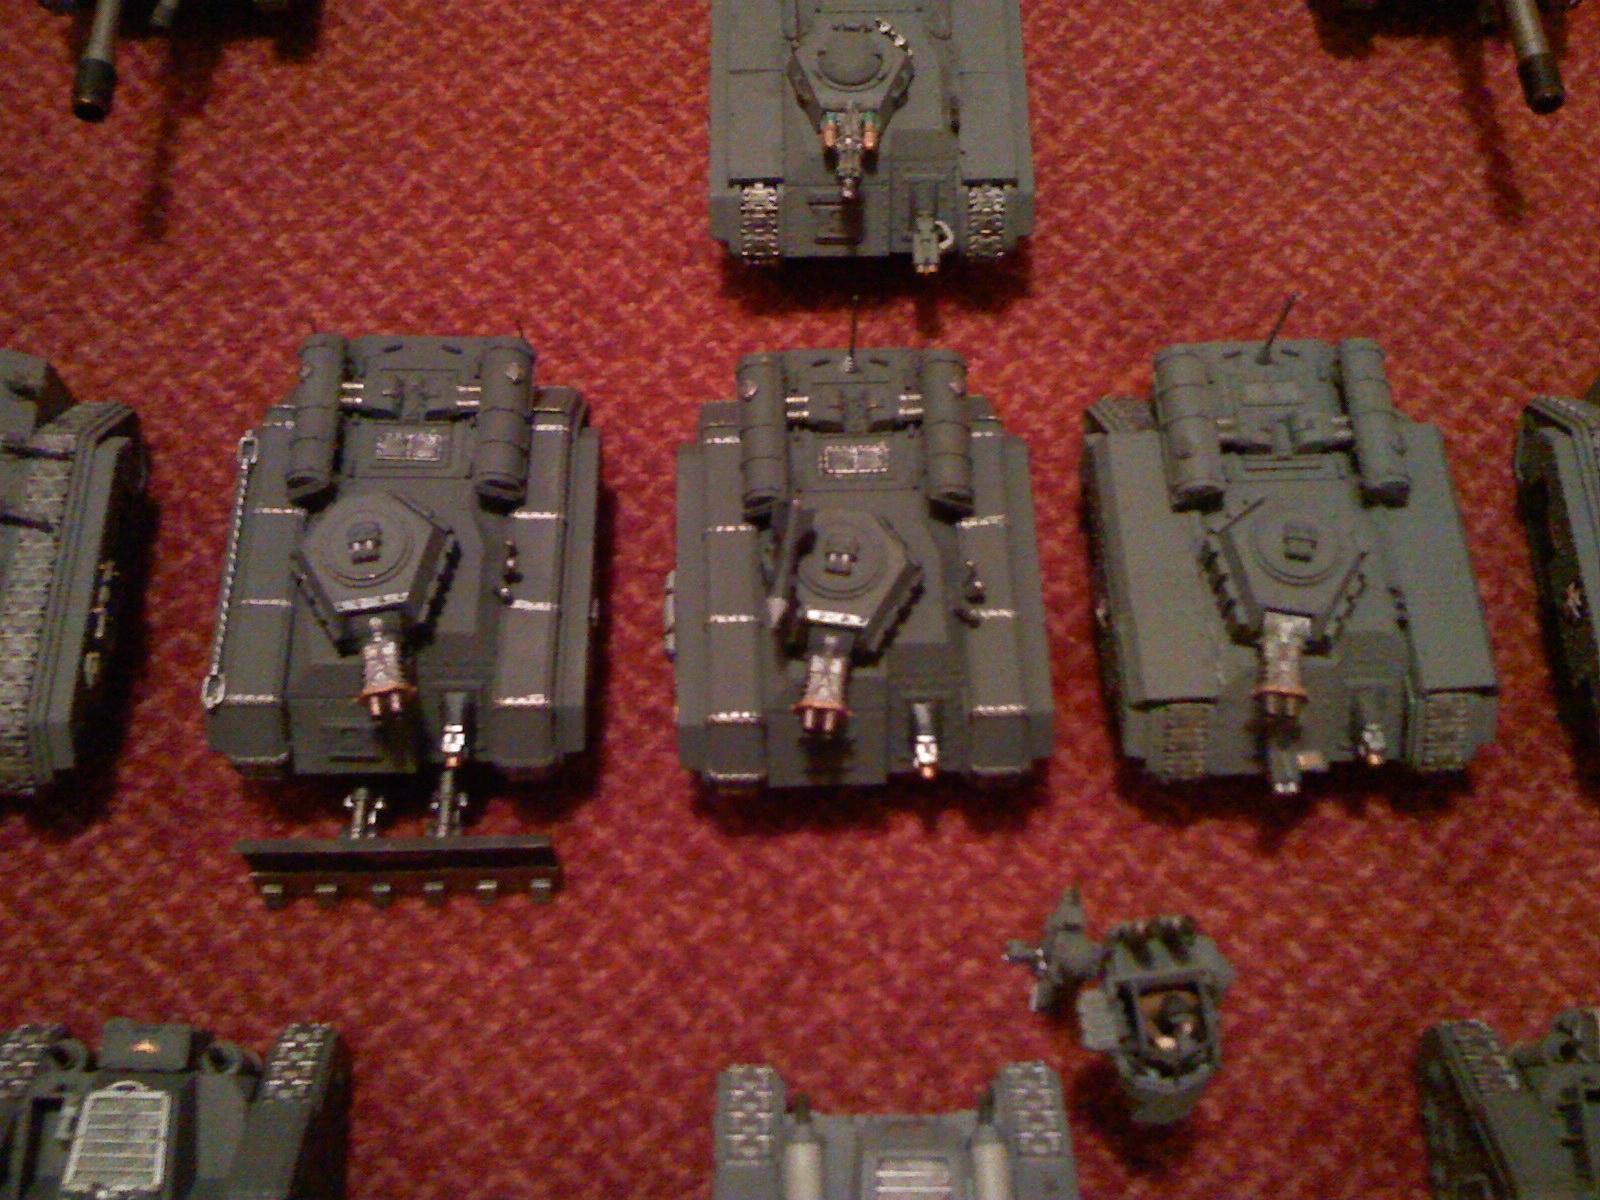 Armored Company, Hellhound, Imperial Guard, Warhammer 40,000